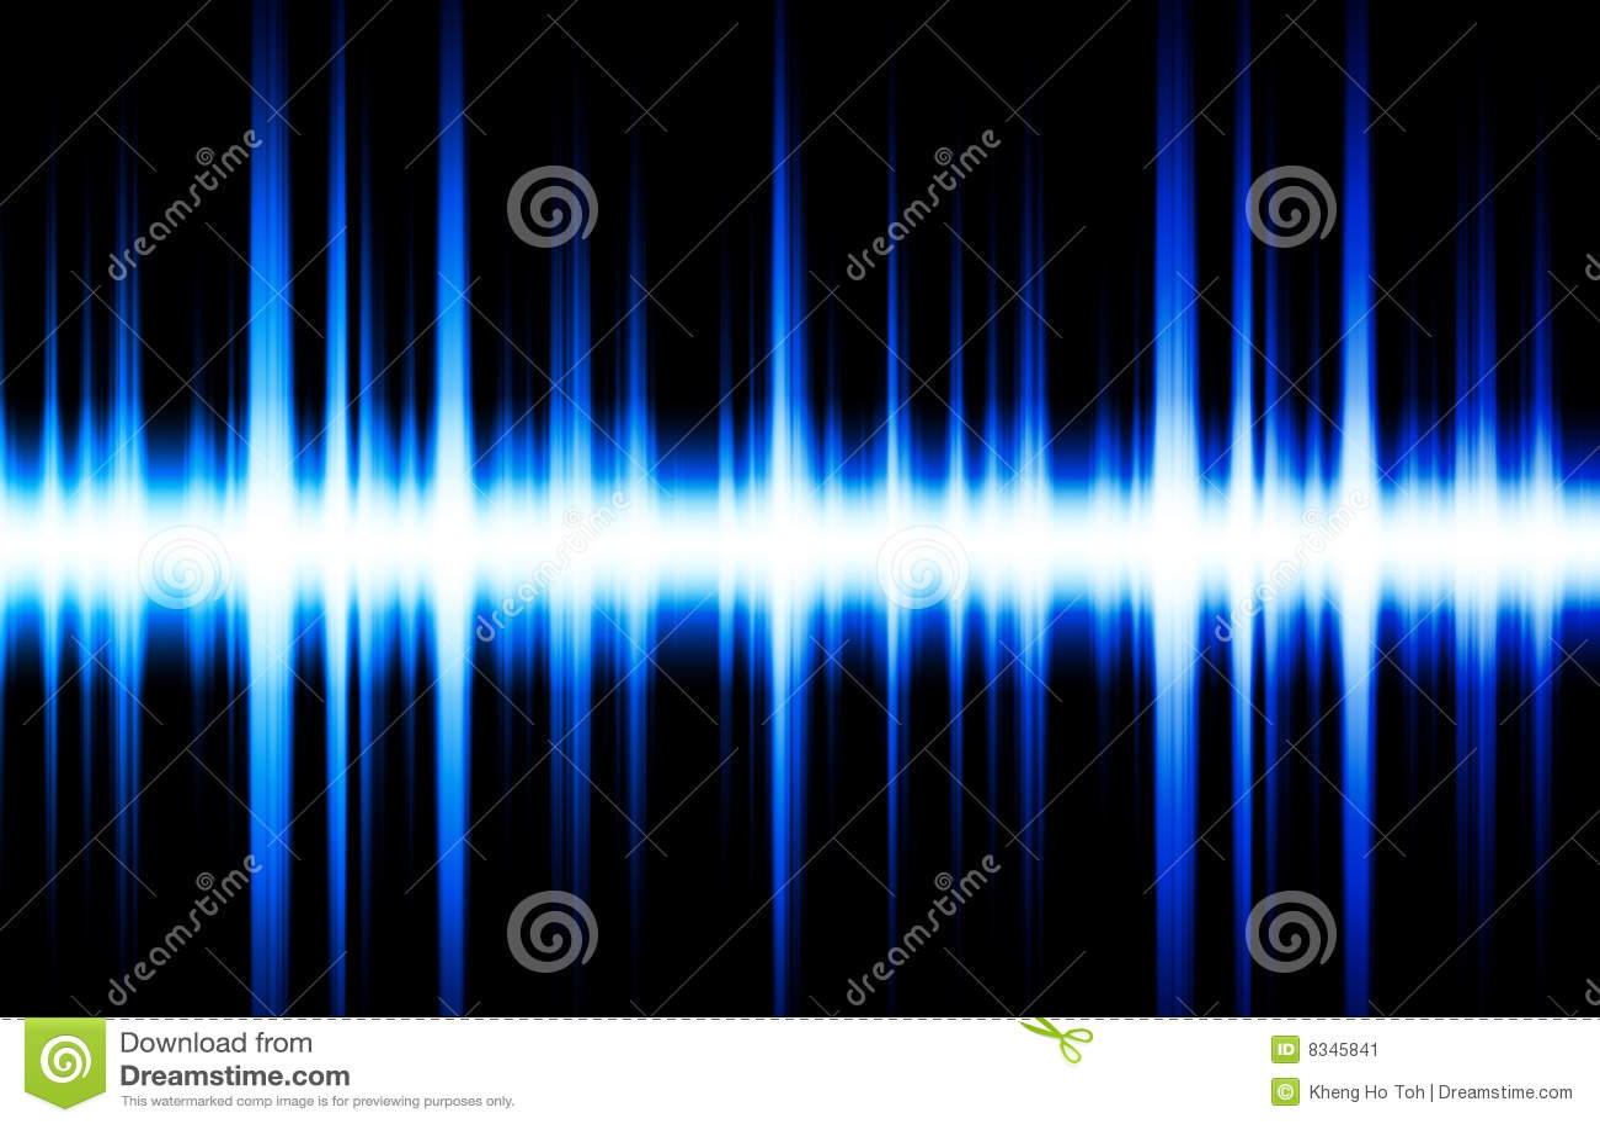 Various - Noise + Rhythm